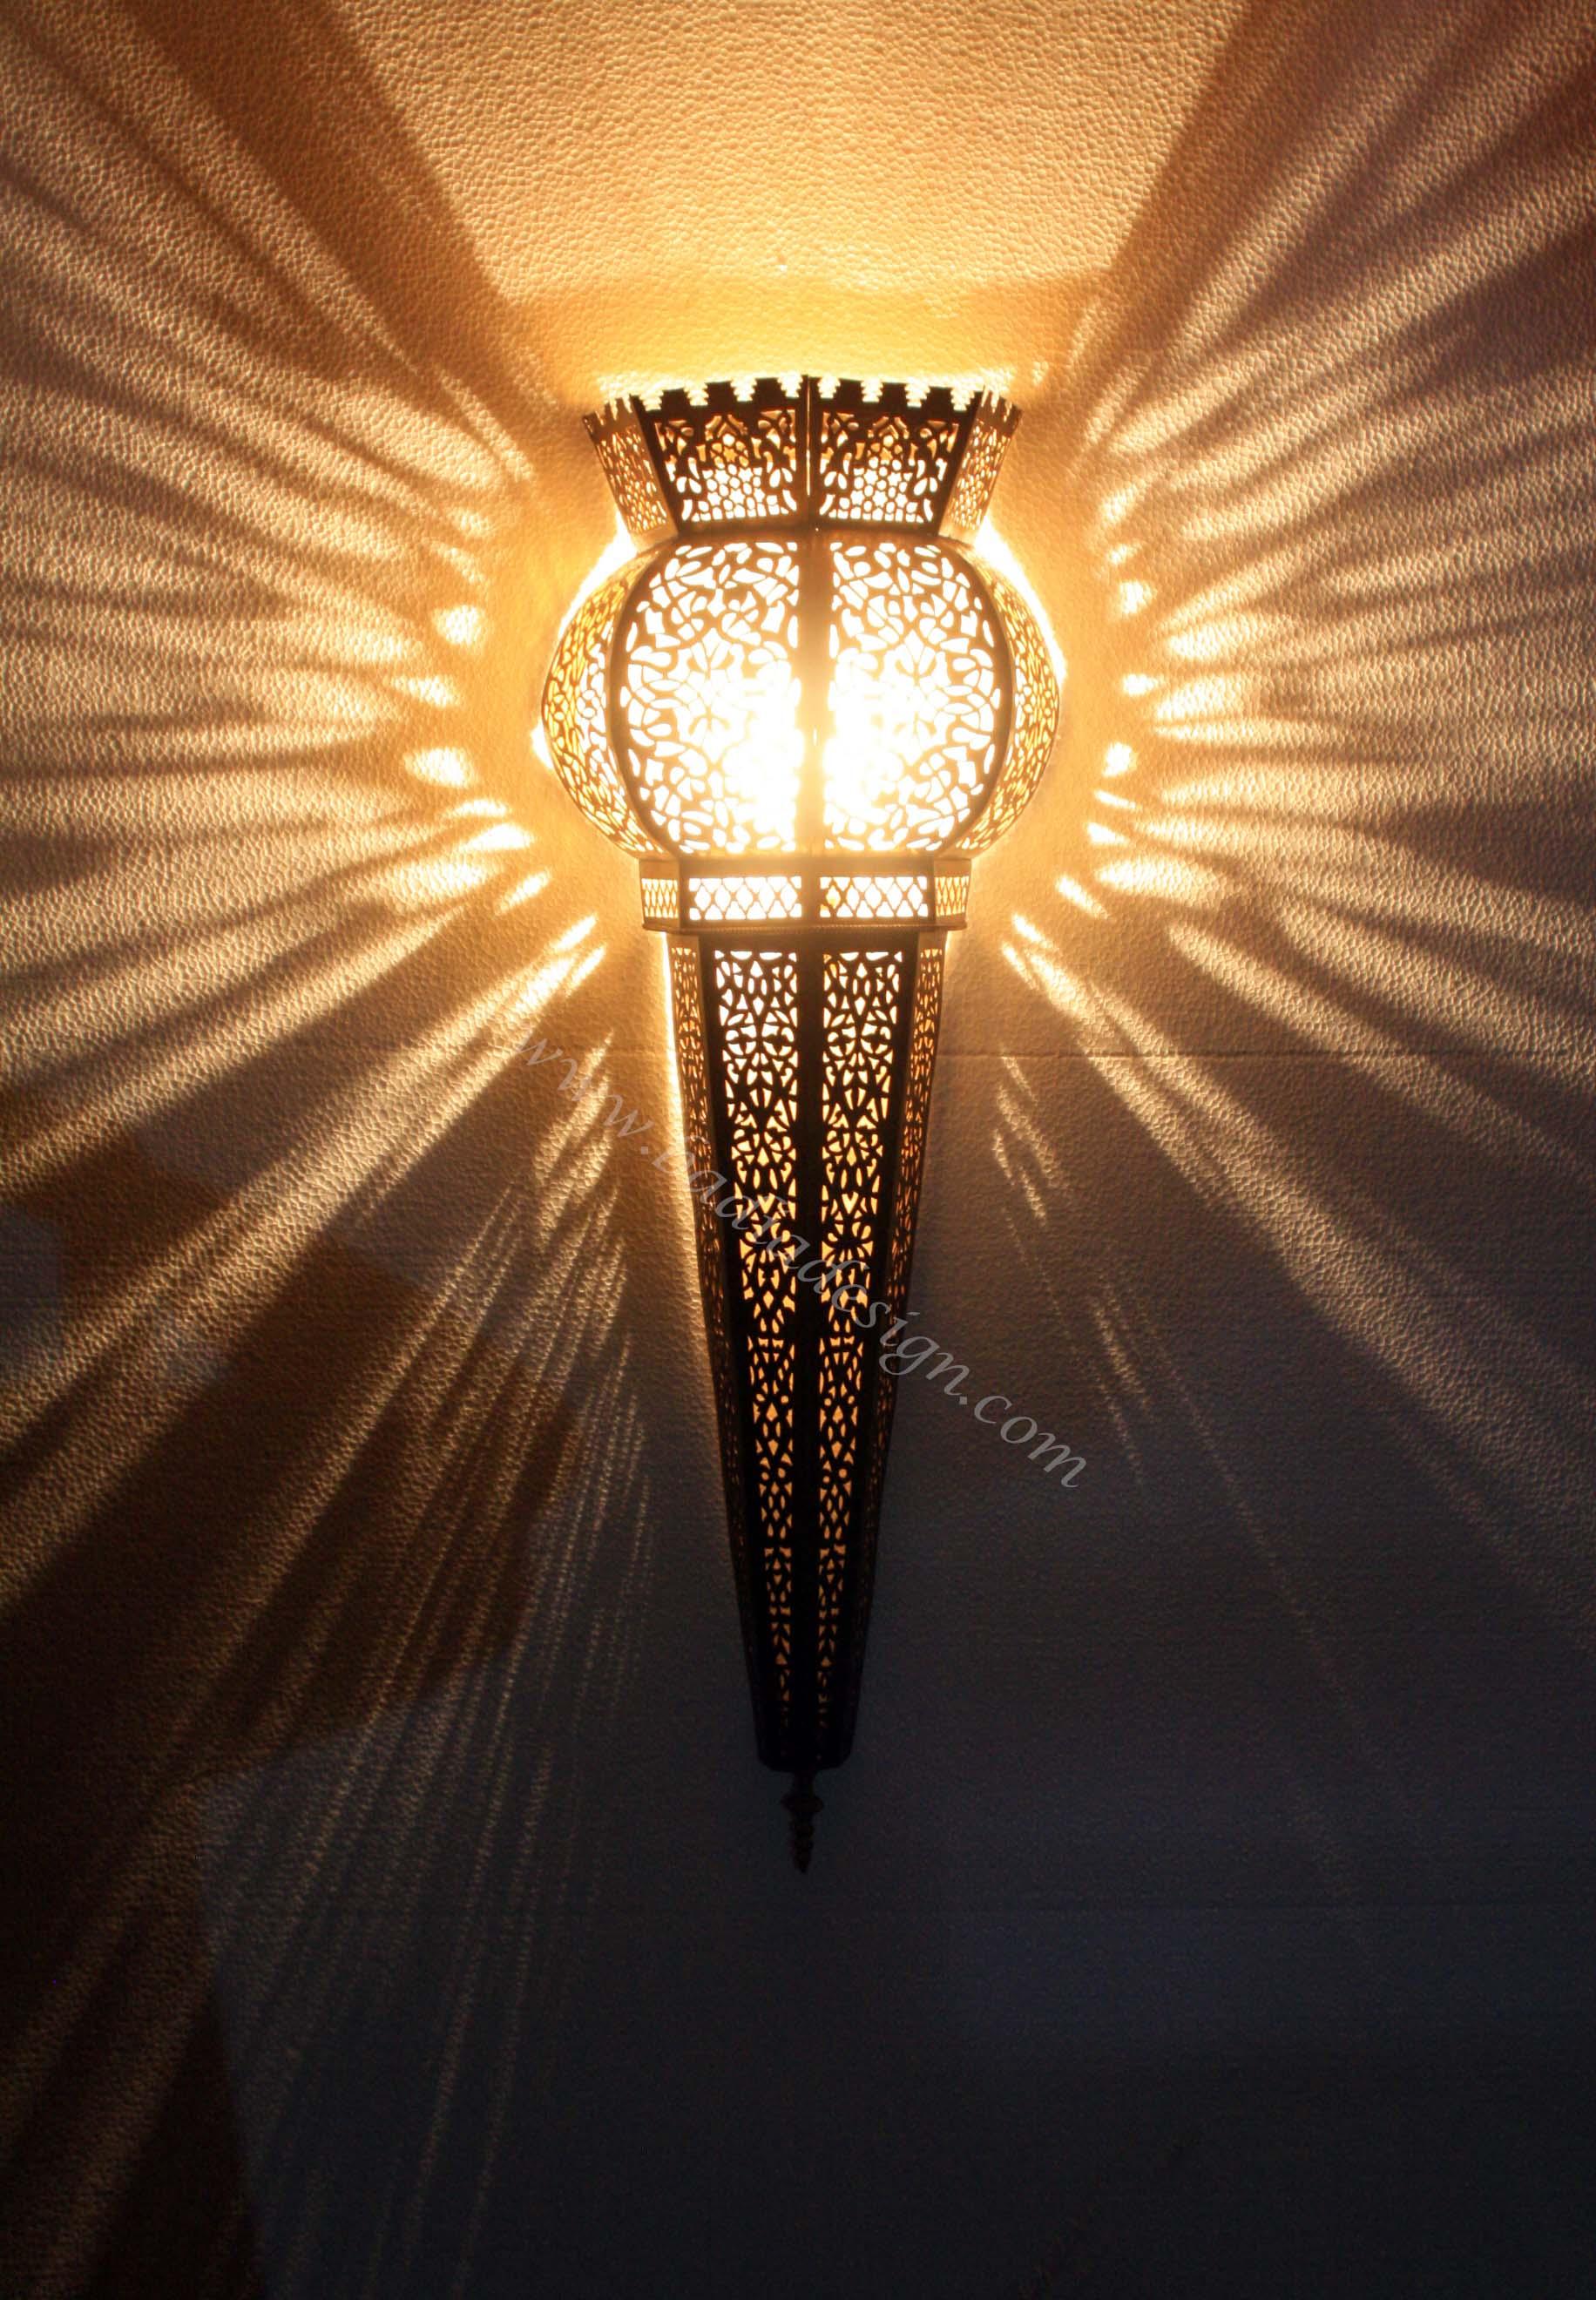 moroccan-lighting-indianapolis.jpg